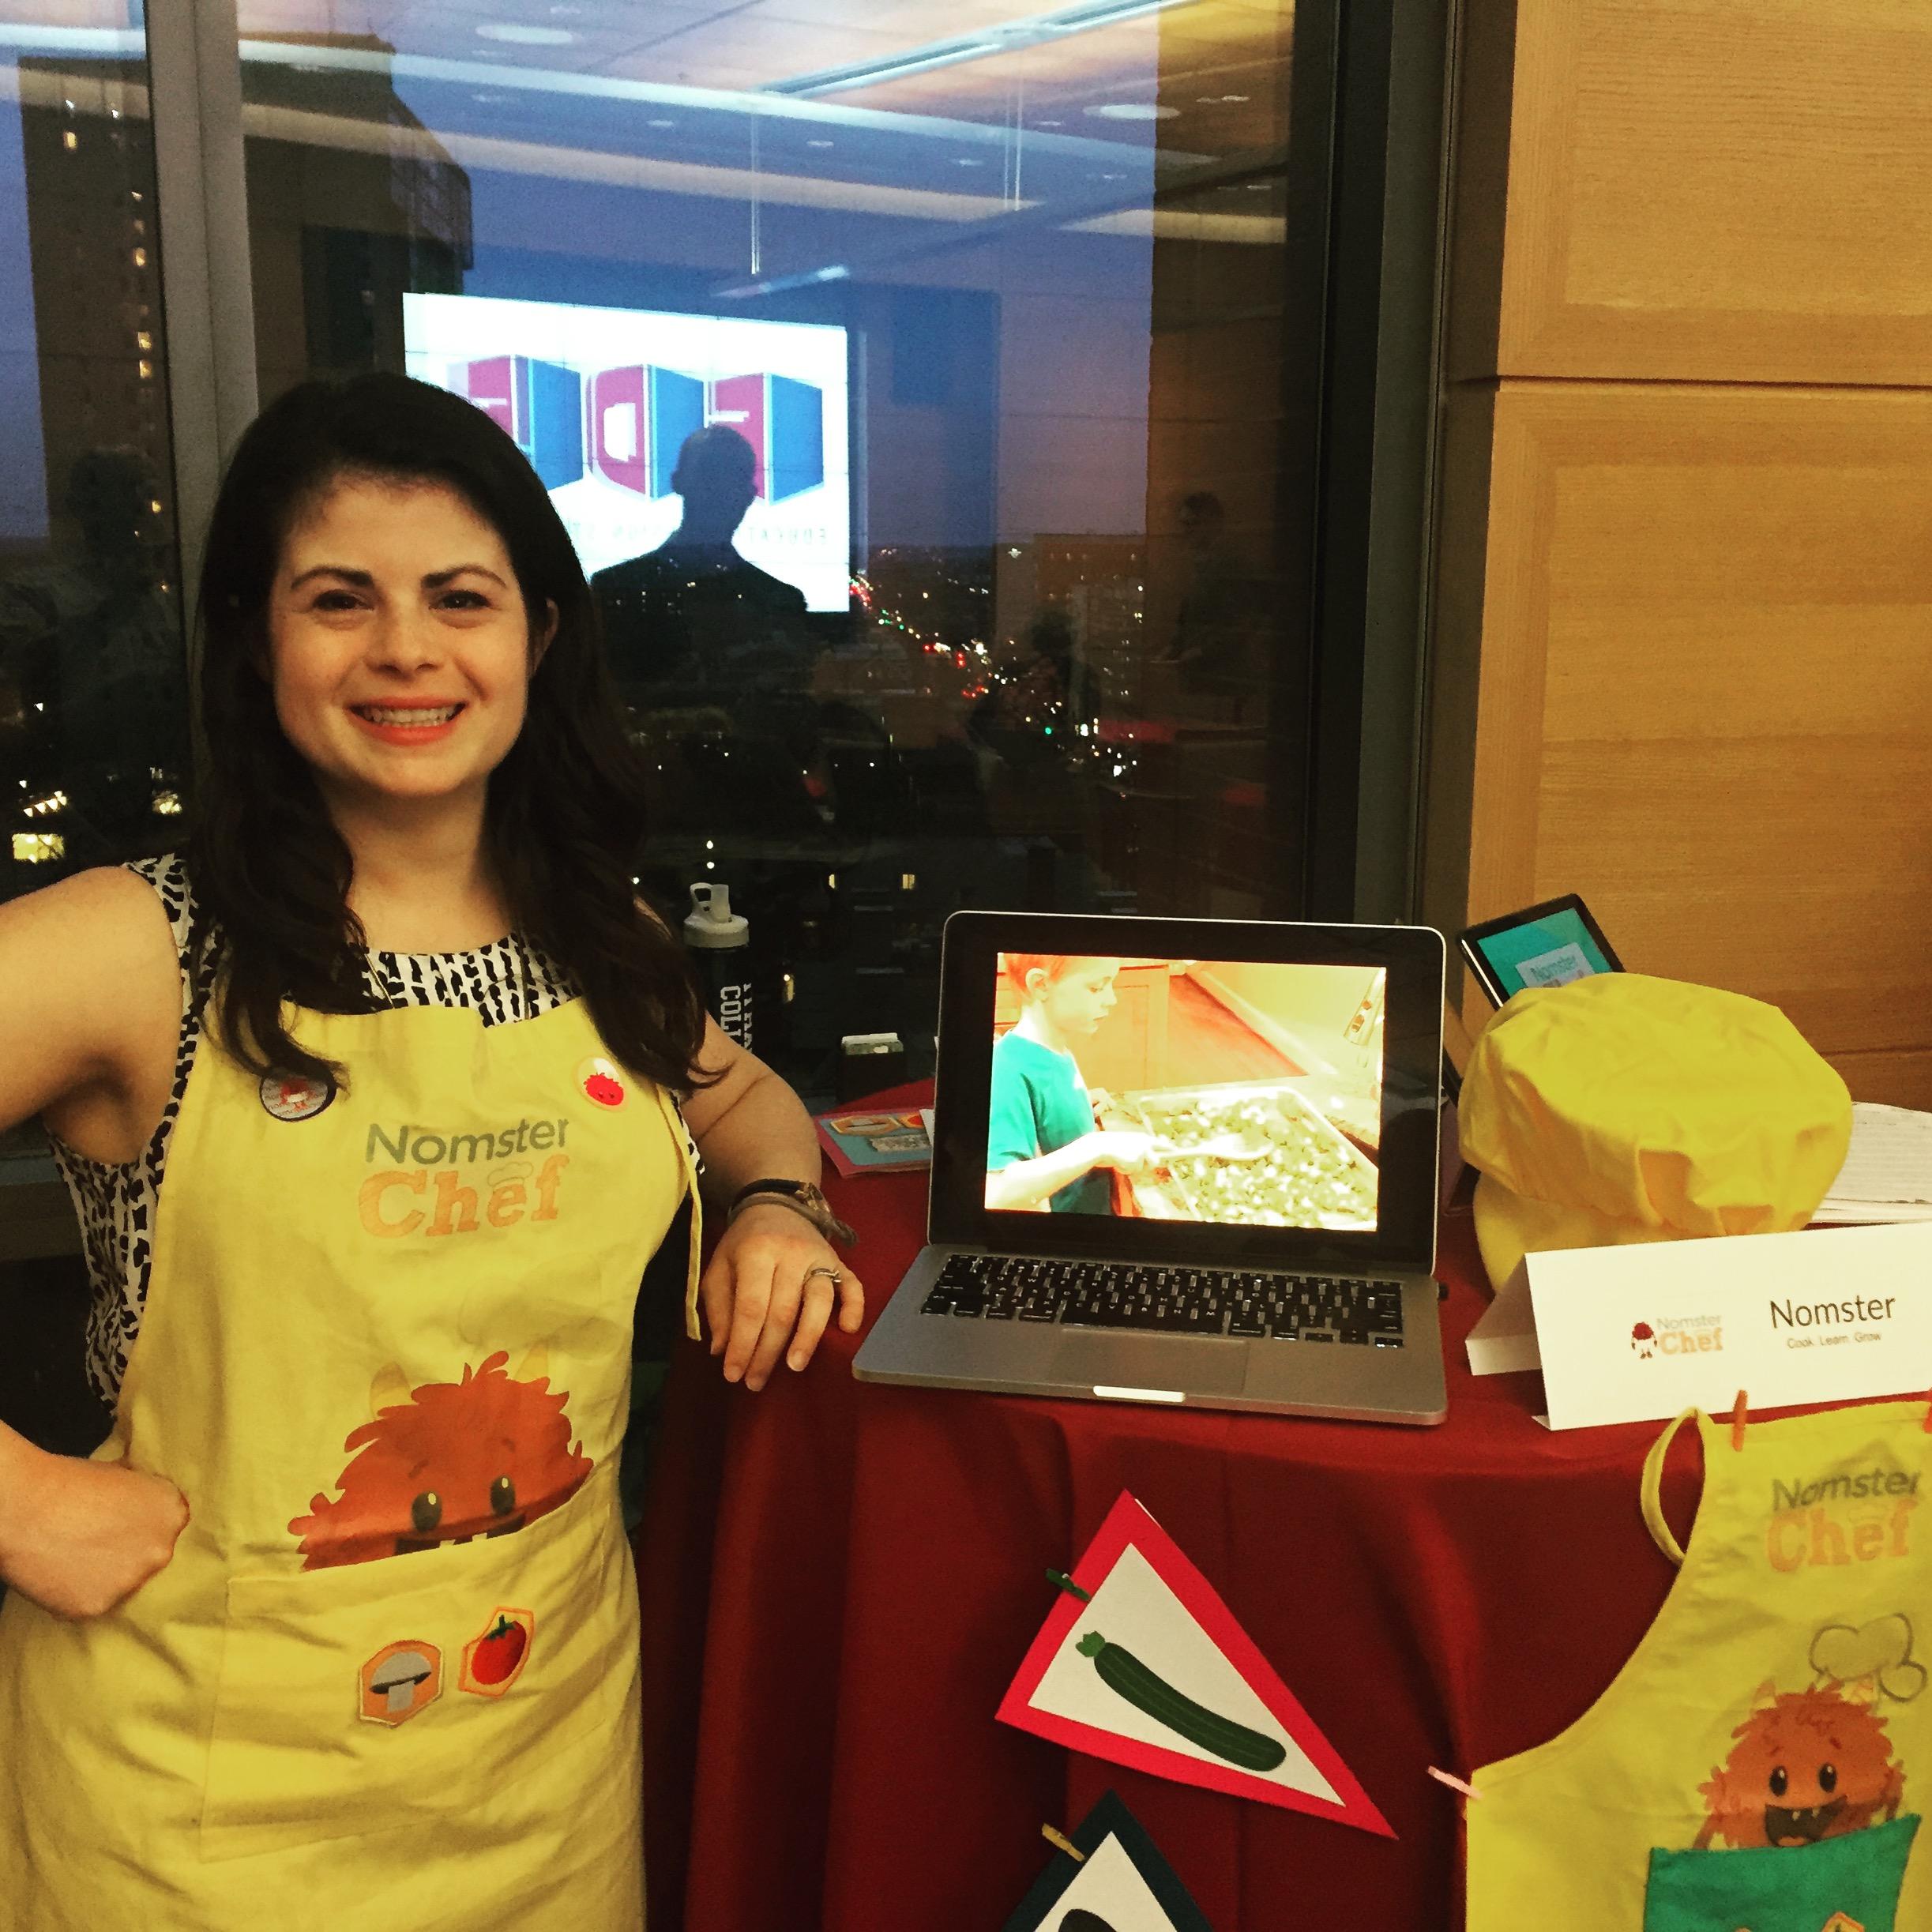 Ashley Moulton | Nomster Chef